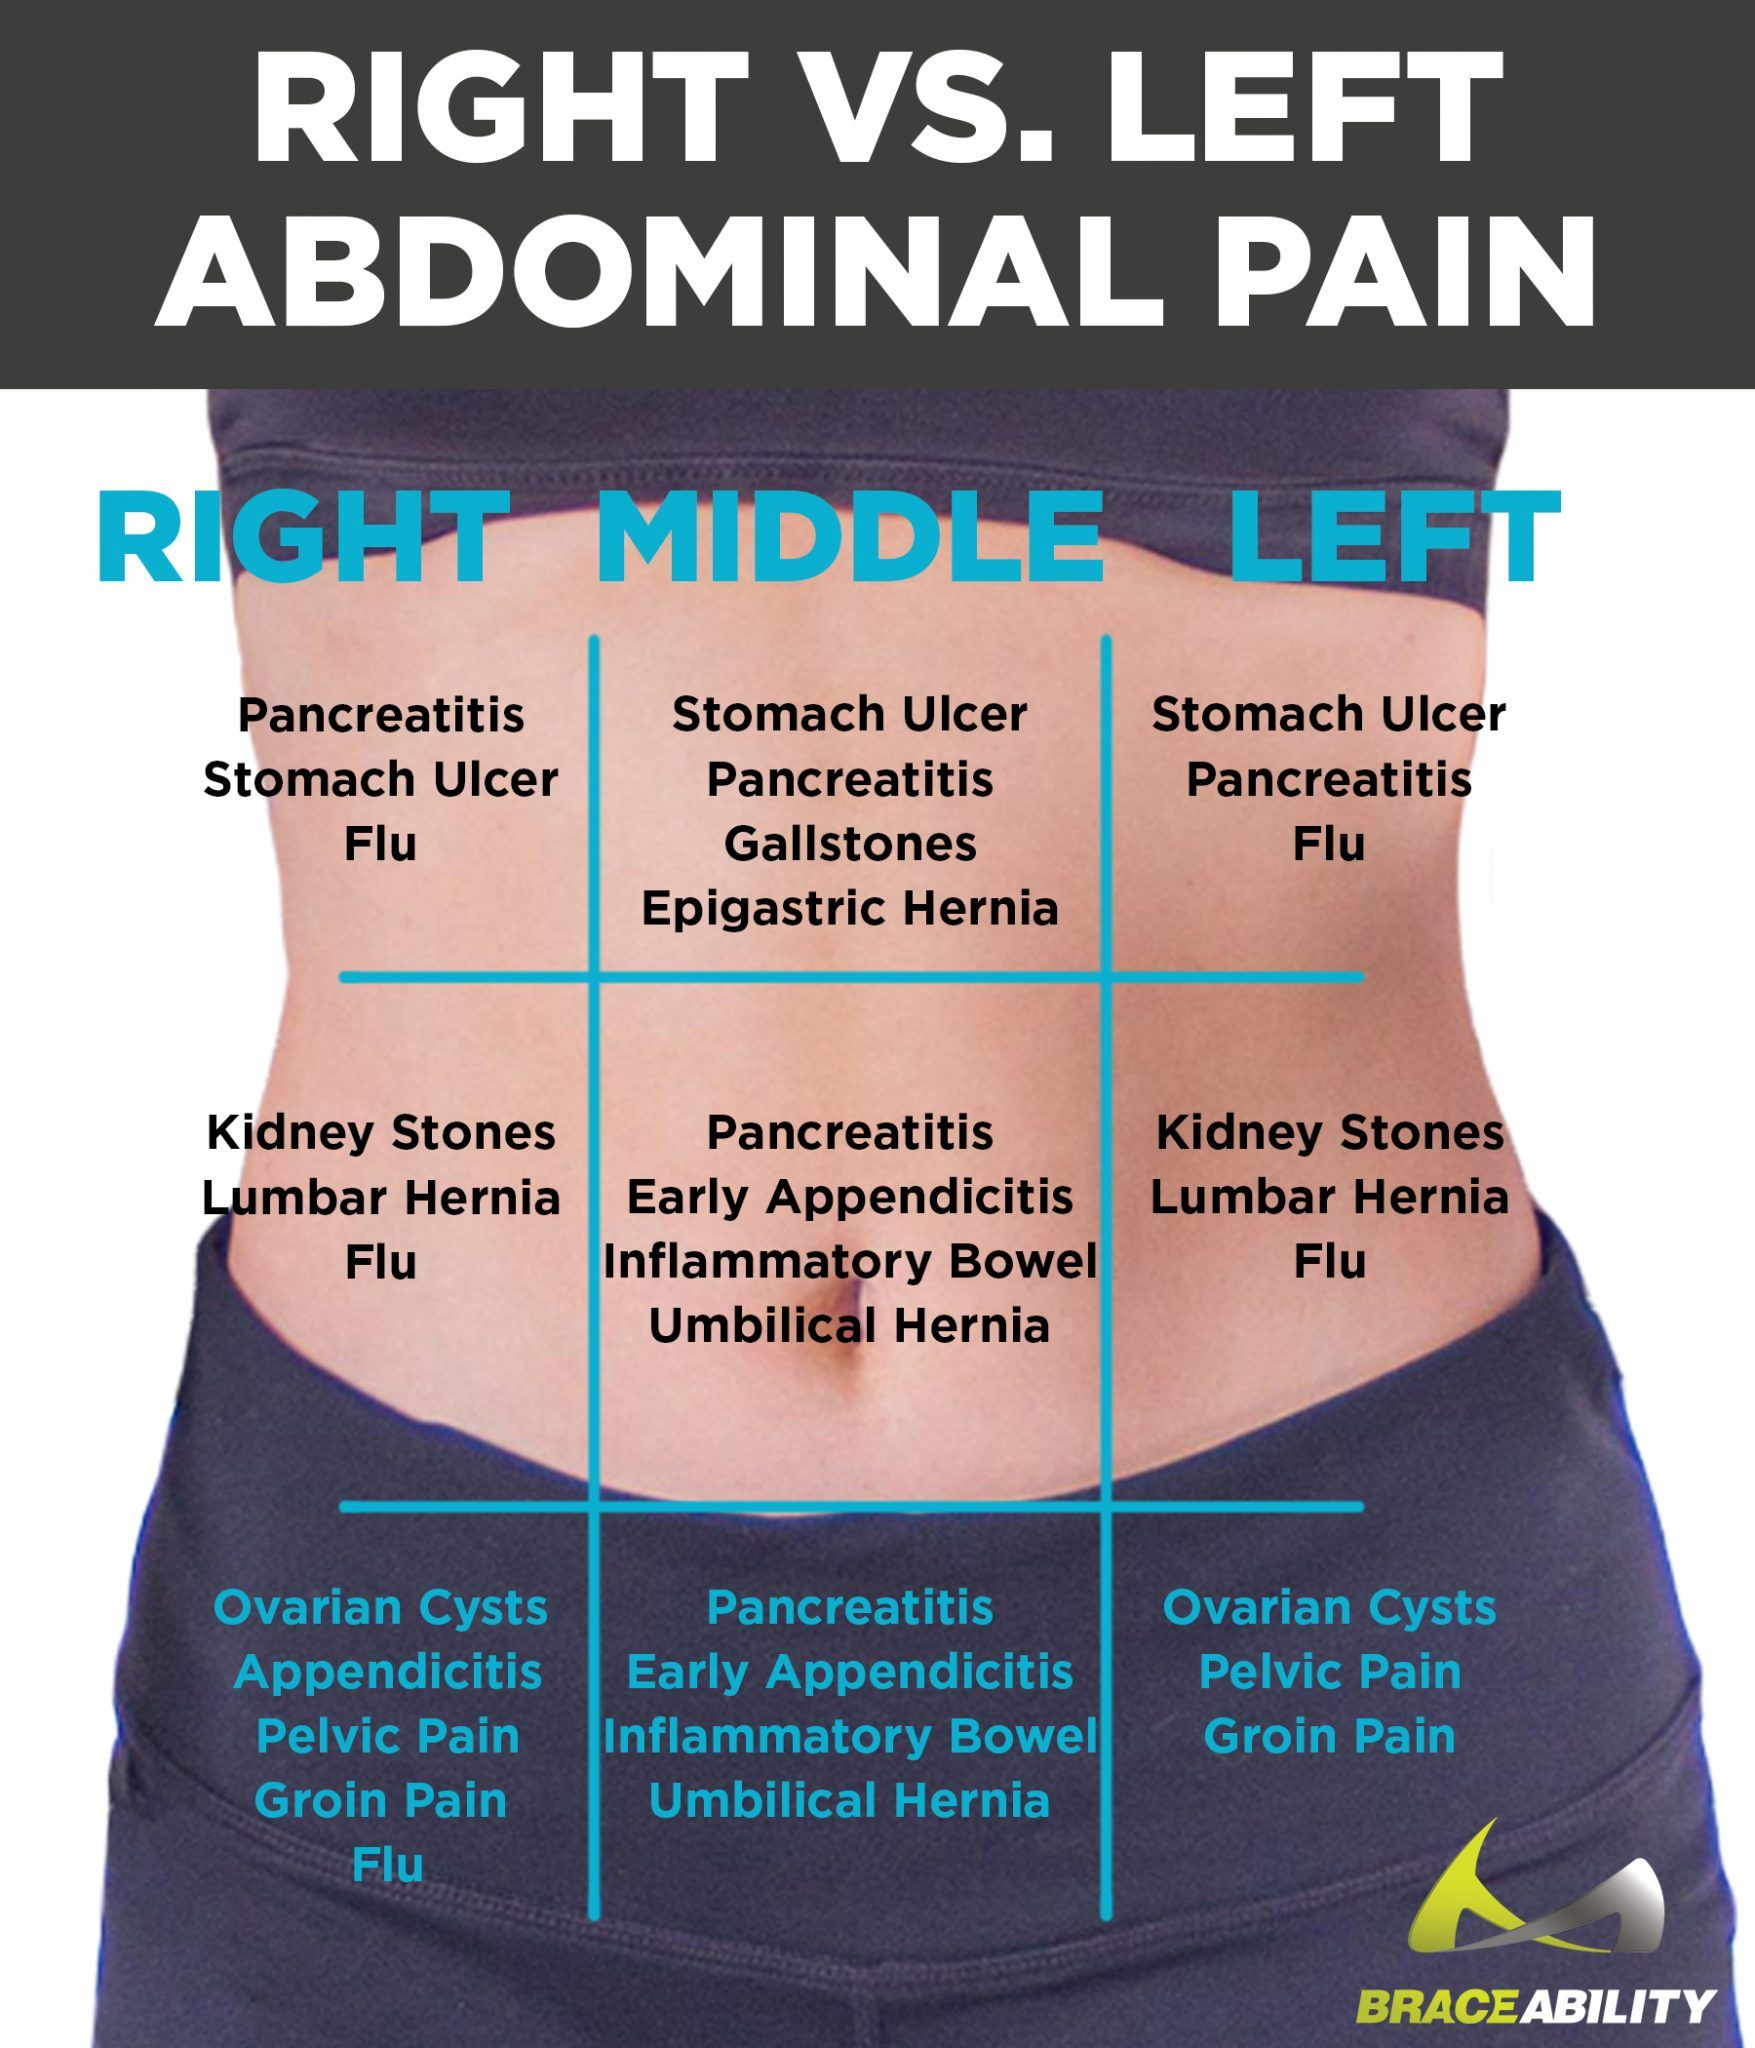 Left Vs. Right Back & Abdominal Pain In Women